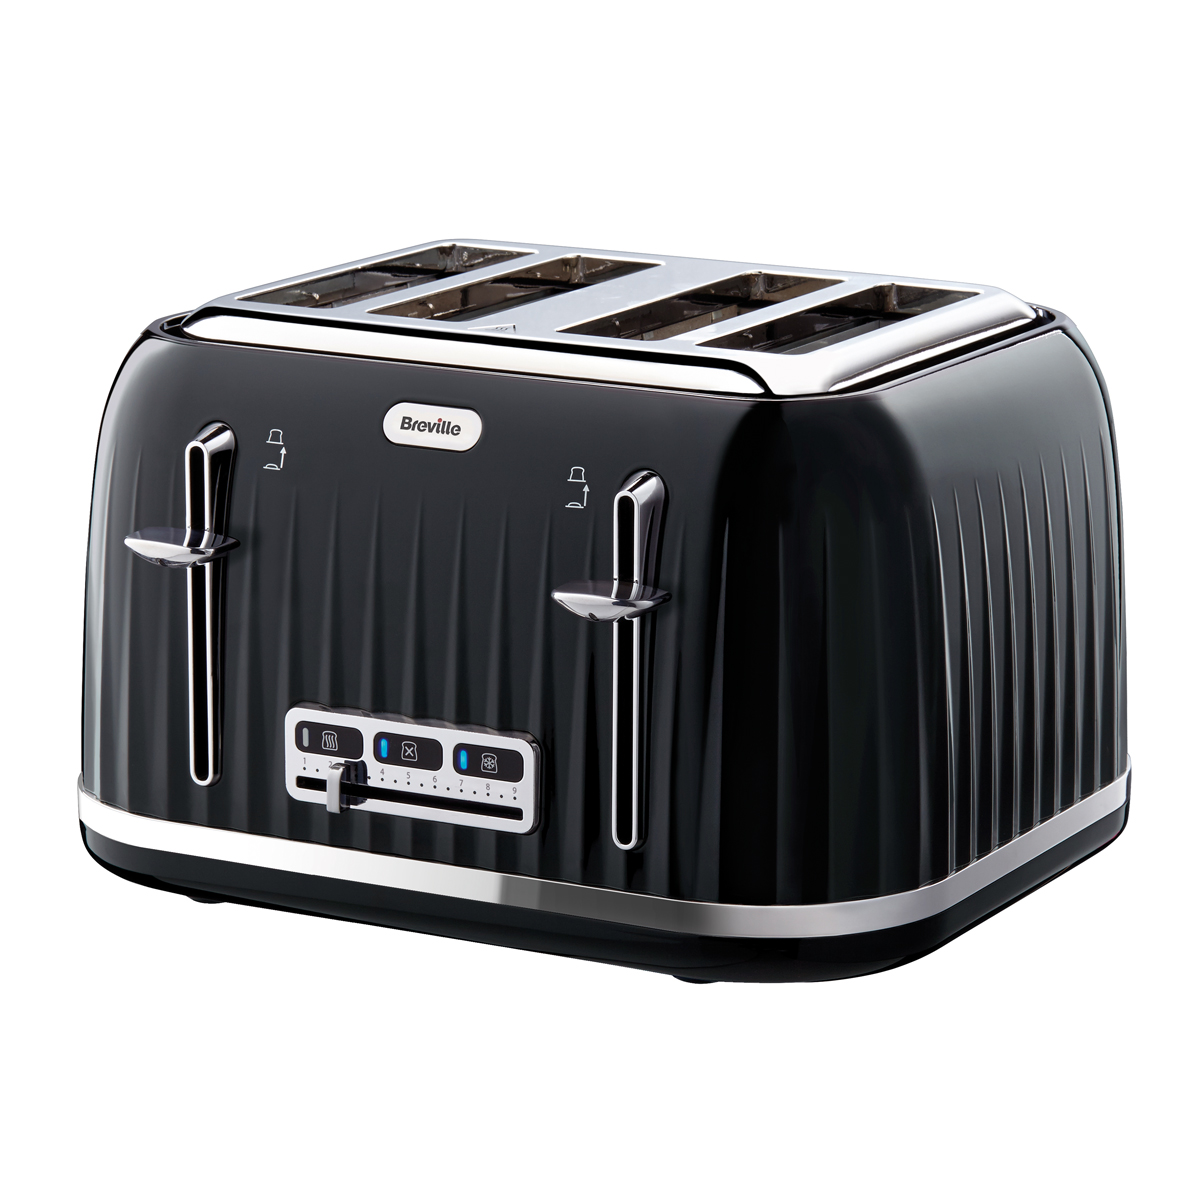 Impressions 4 Slice Toaster, Black